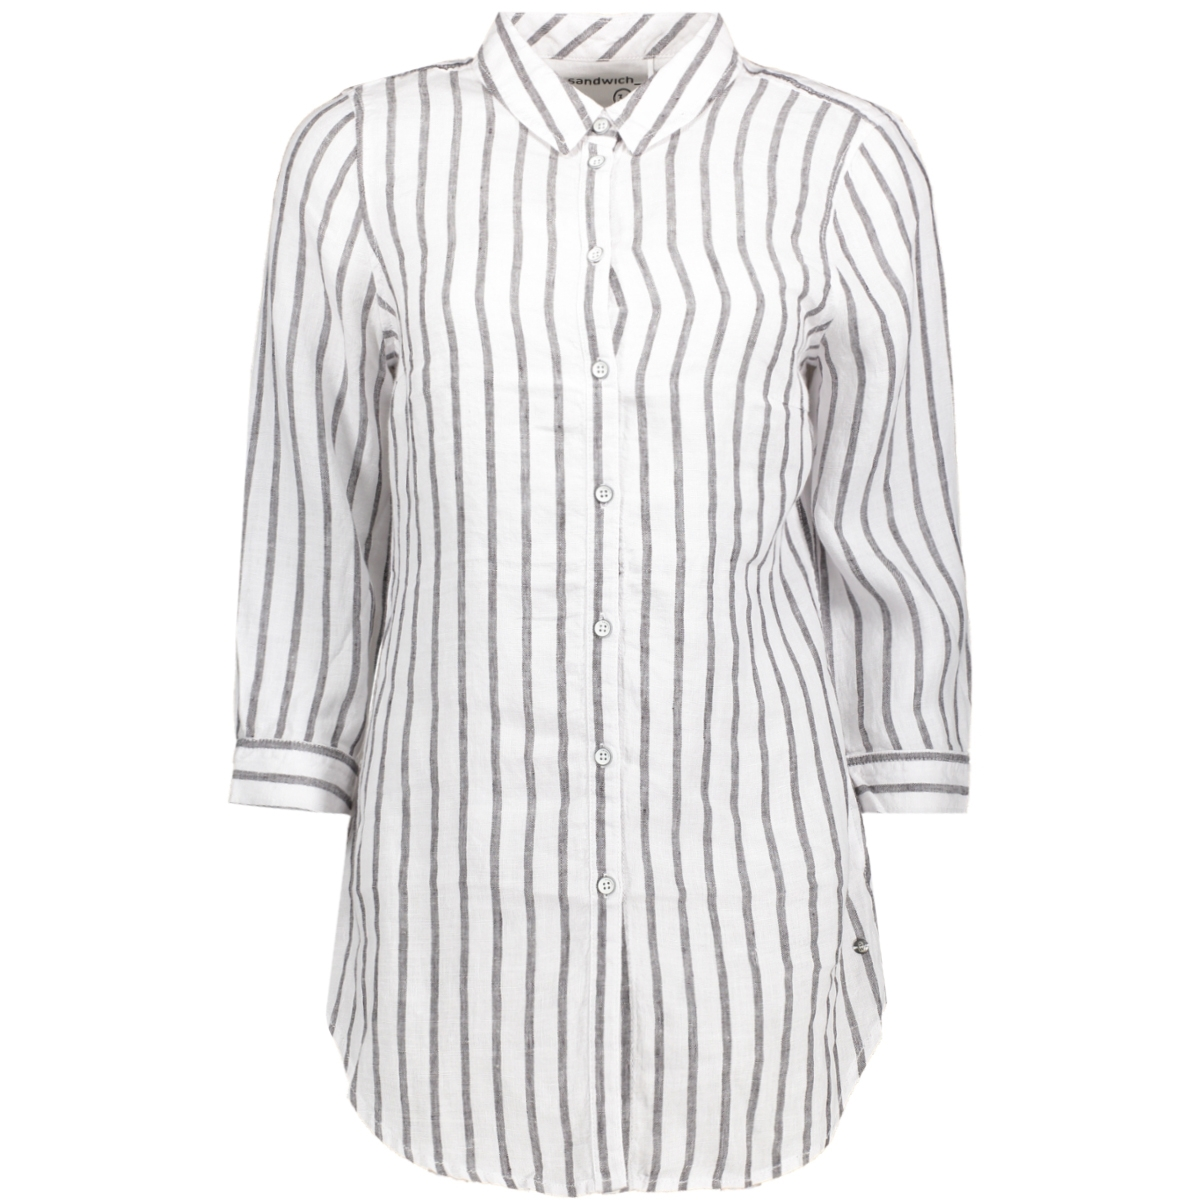 22001170 sandwich blouse 80077